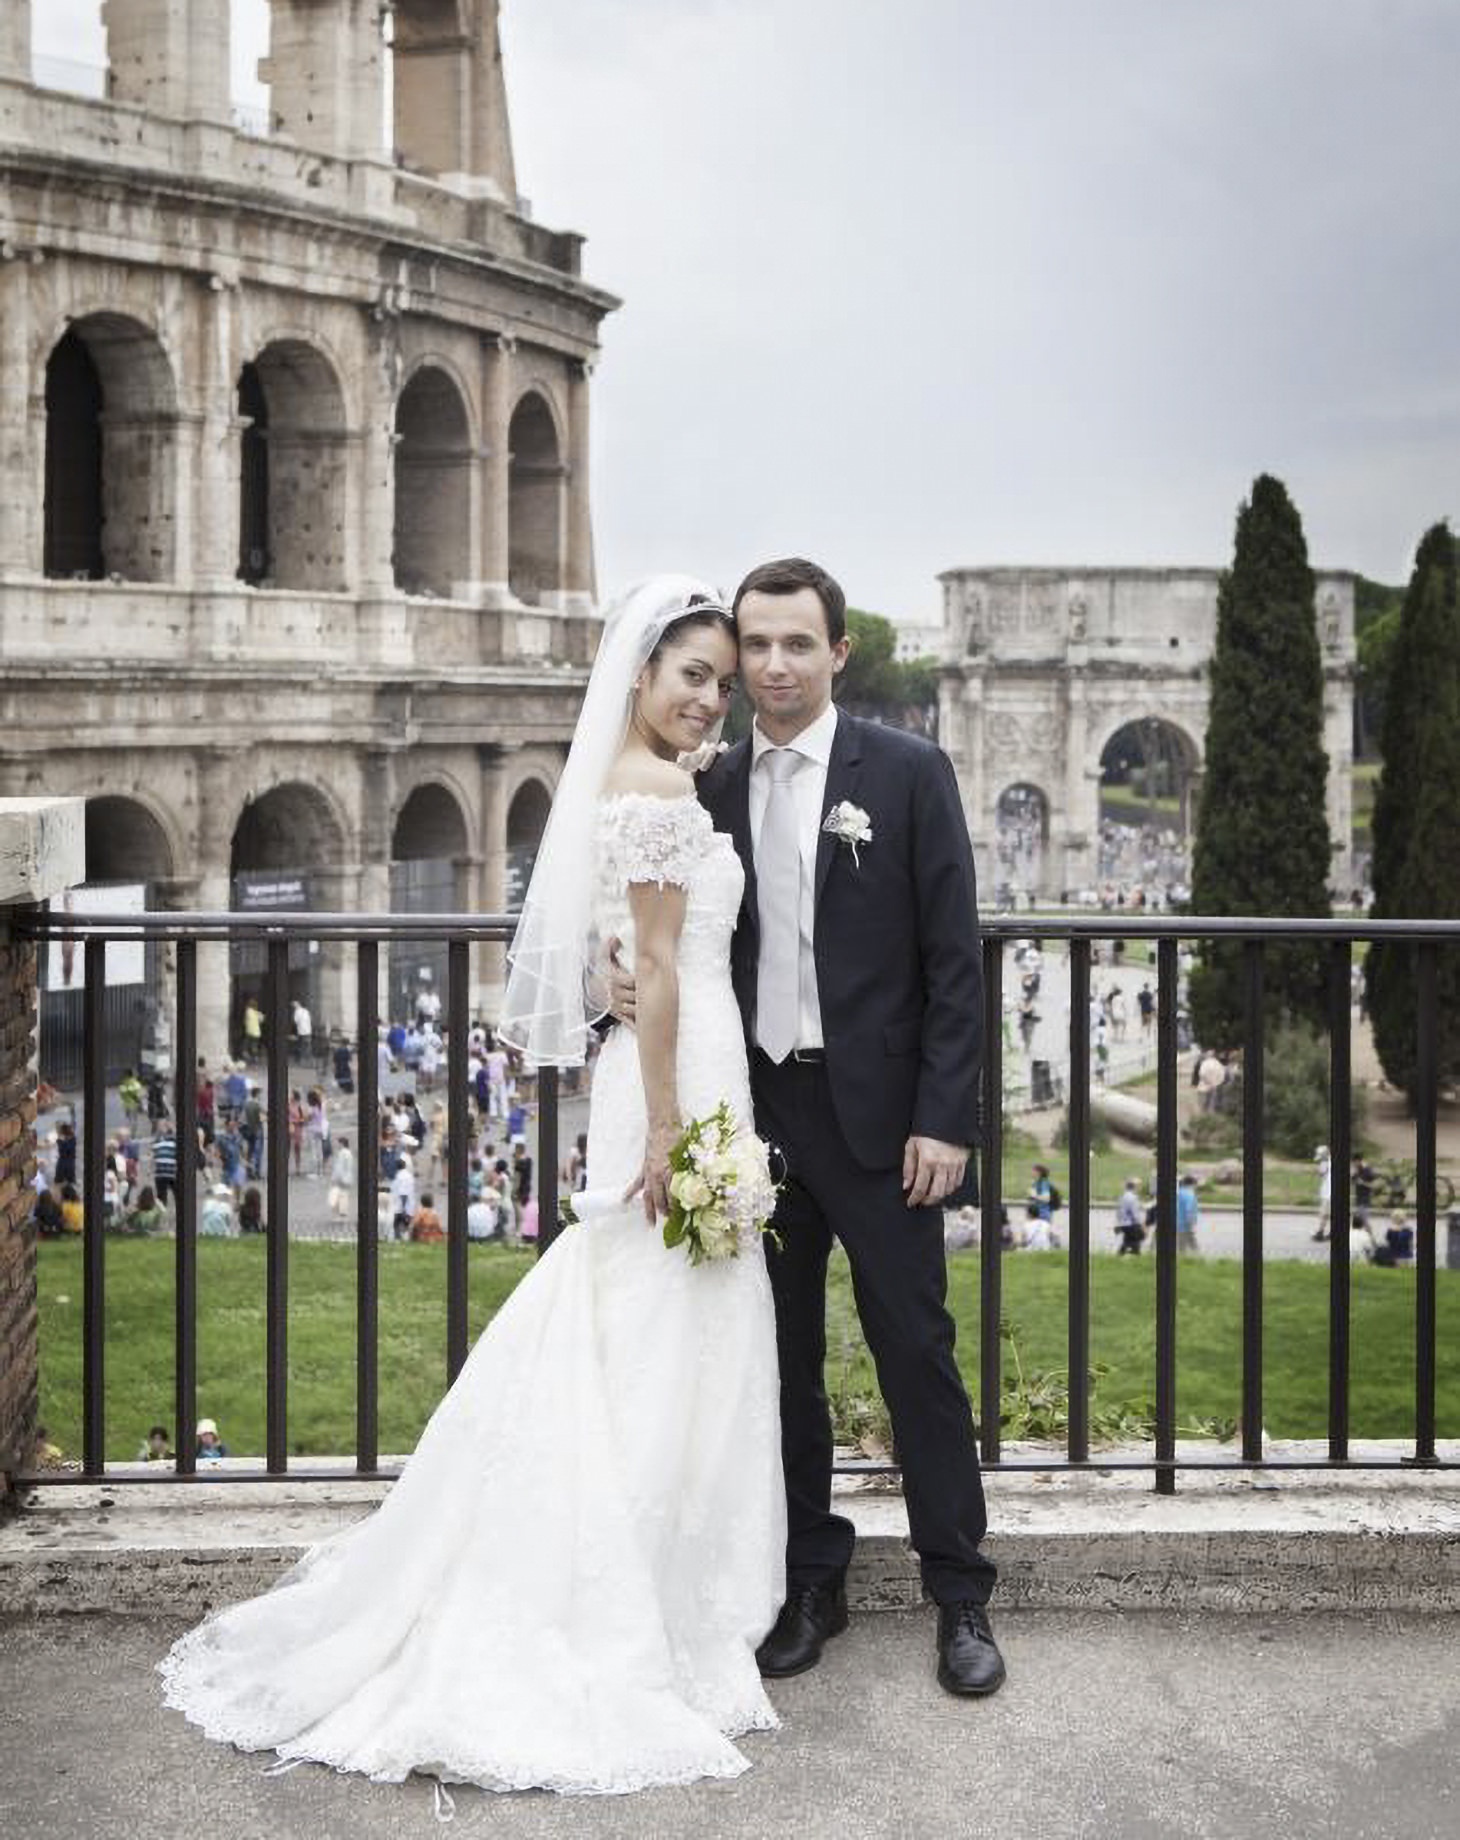 Rali & Jakub | Rome